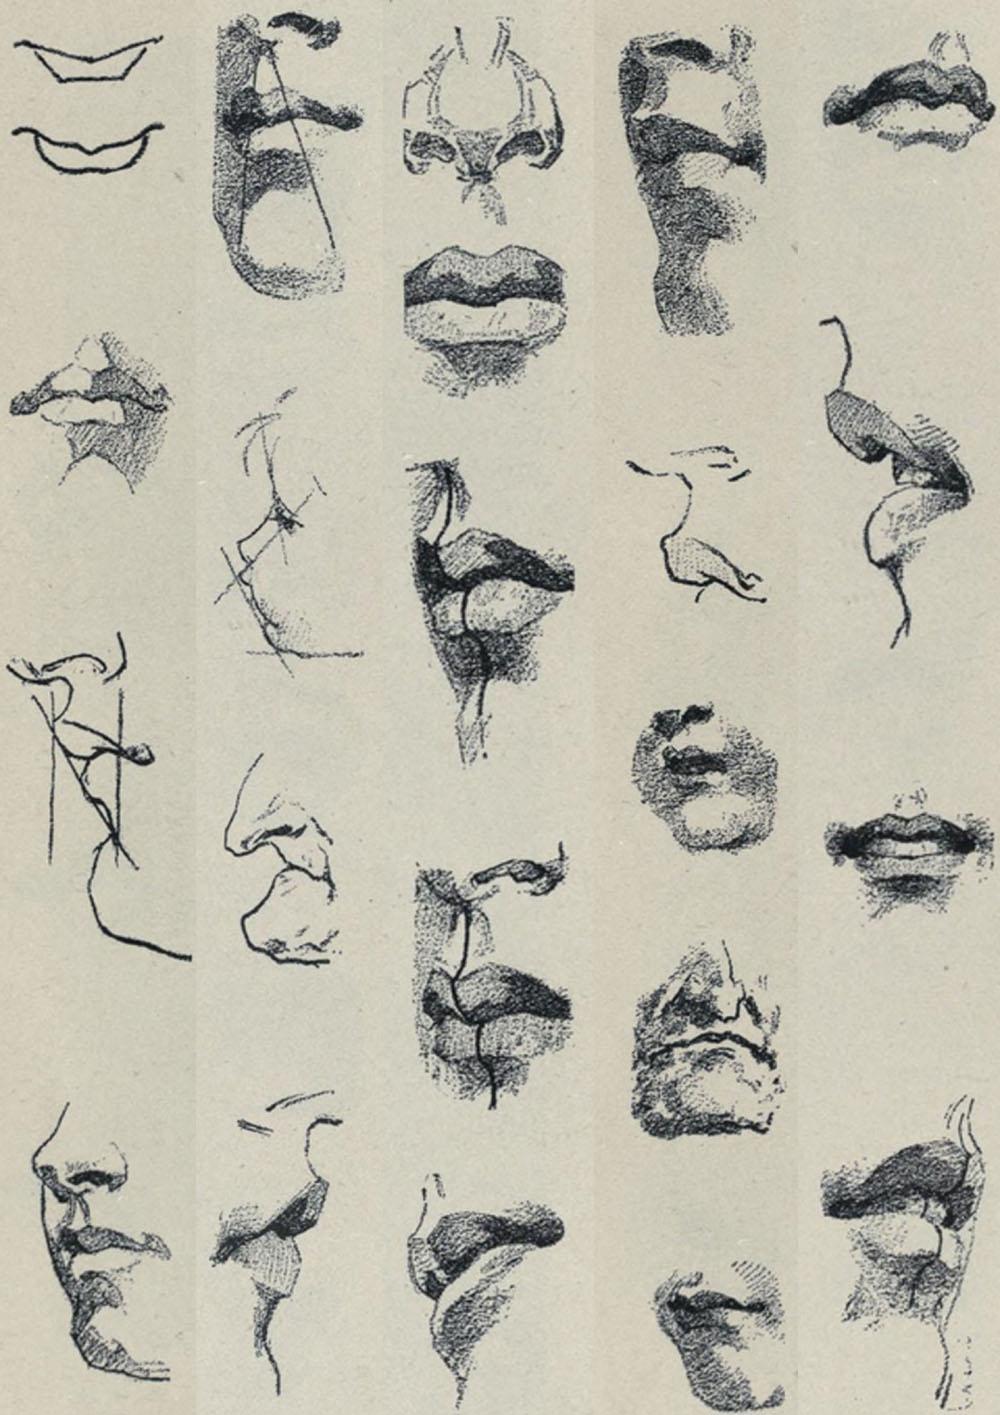 carlo-ruini-anatomia-labios